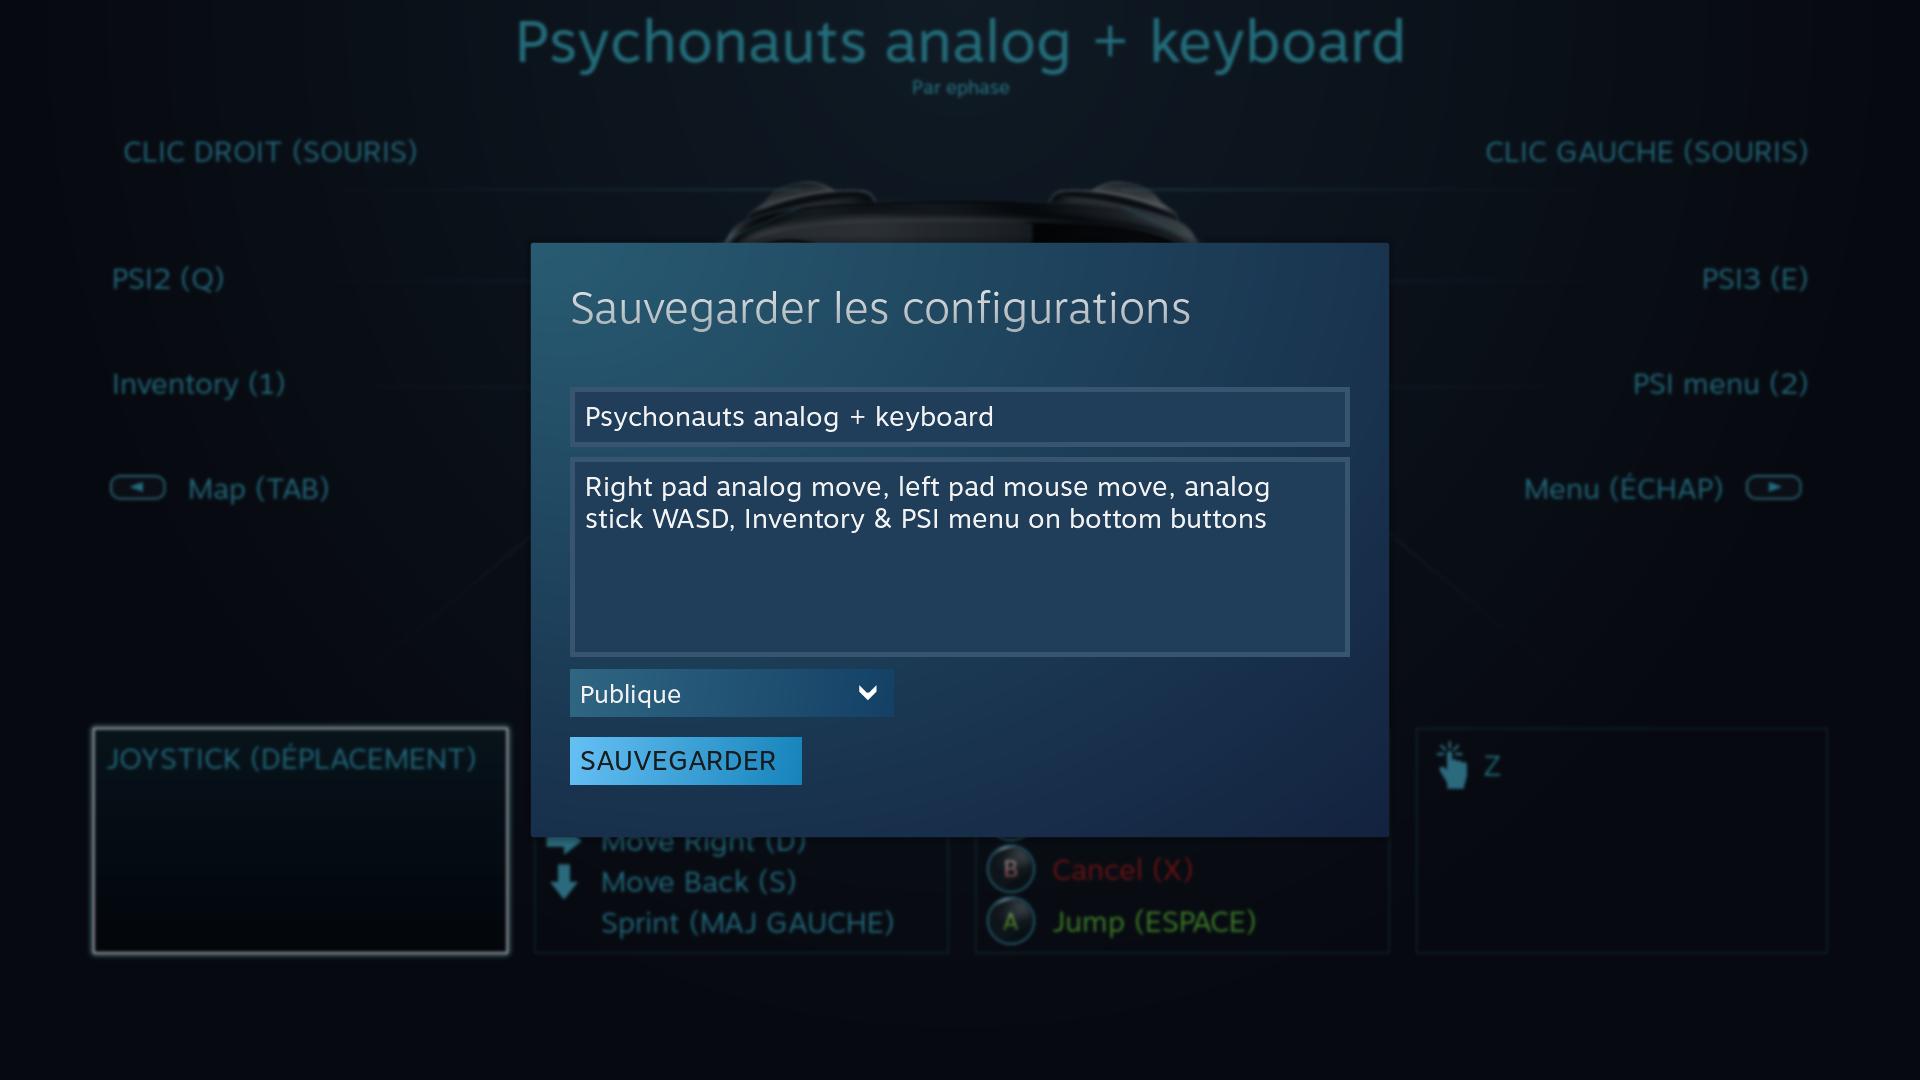 Psychonauts,